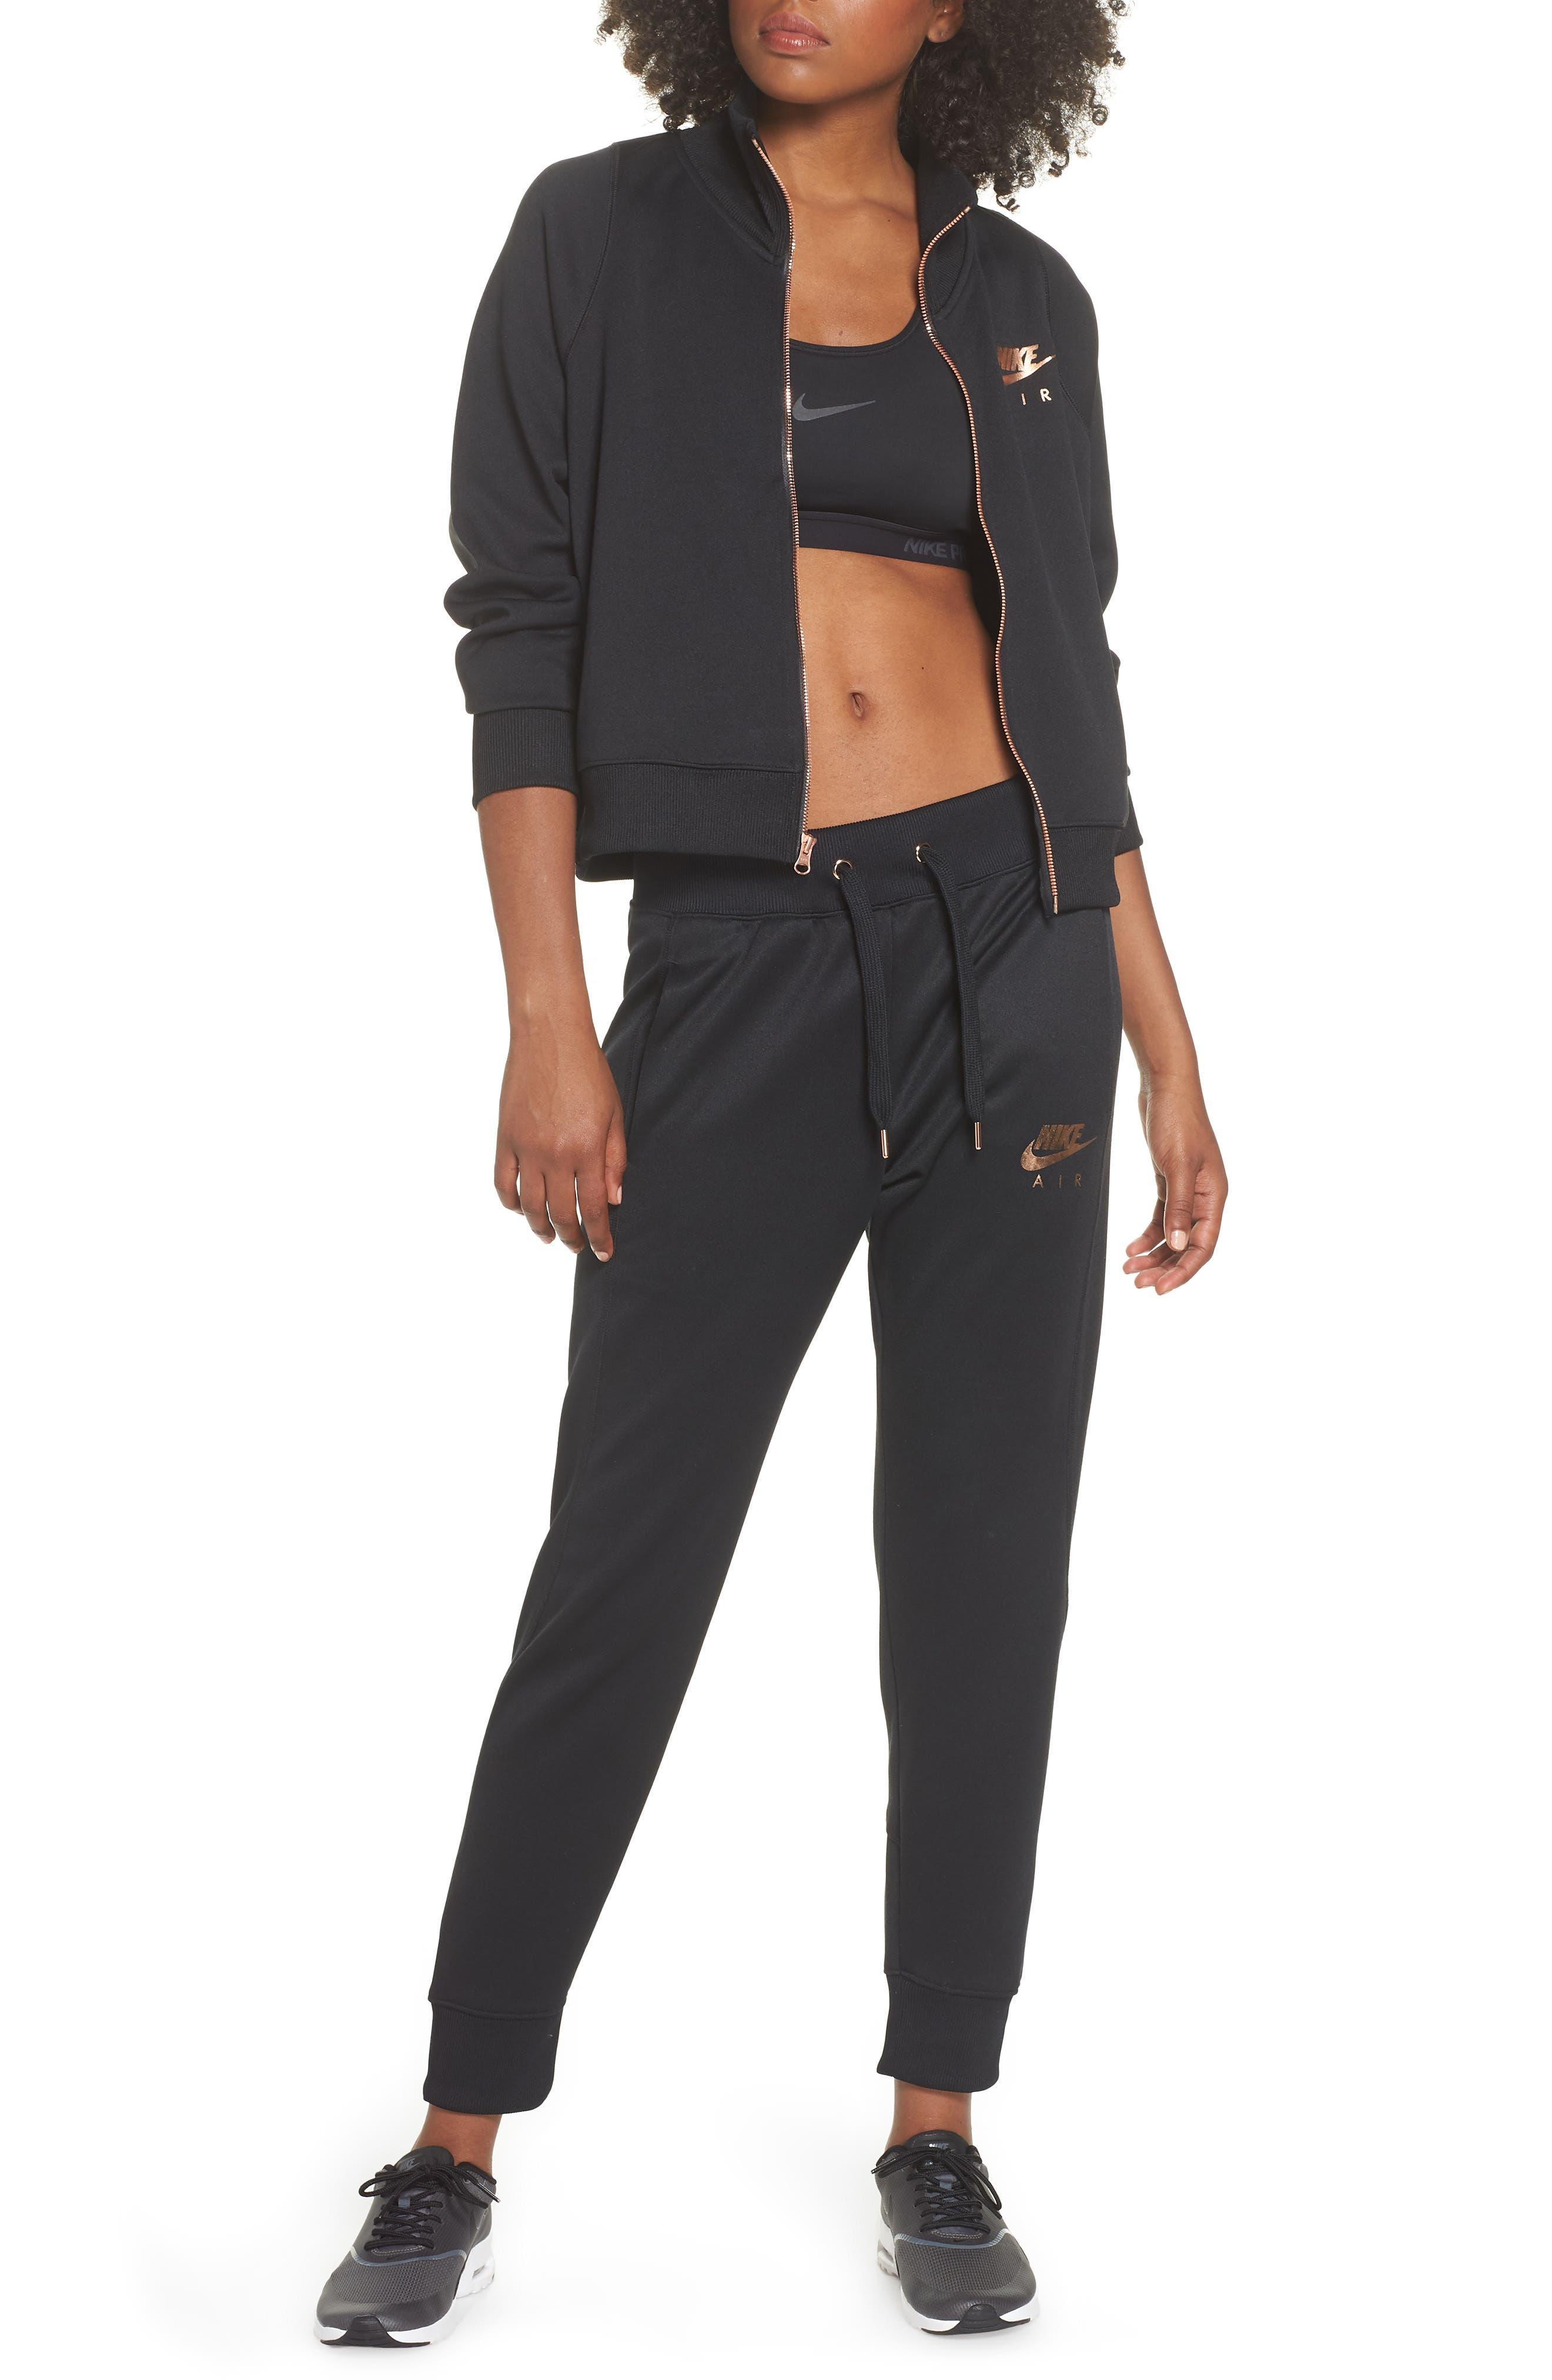 Sportswear Air Jogger Pants,                             Alternate thumbnail 9, color,                             010